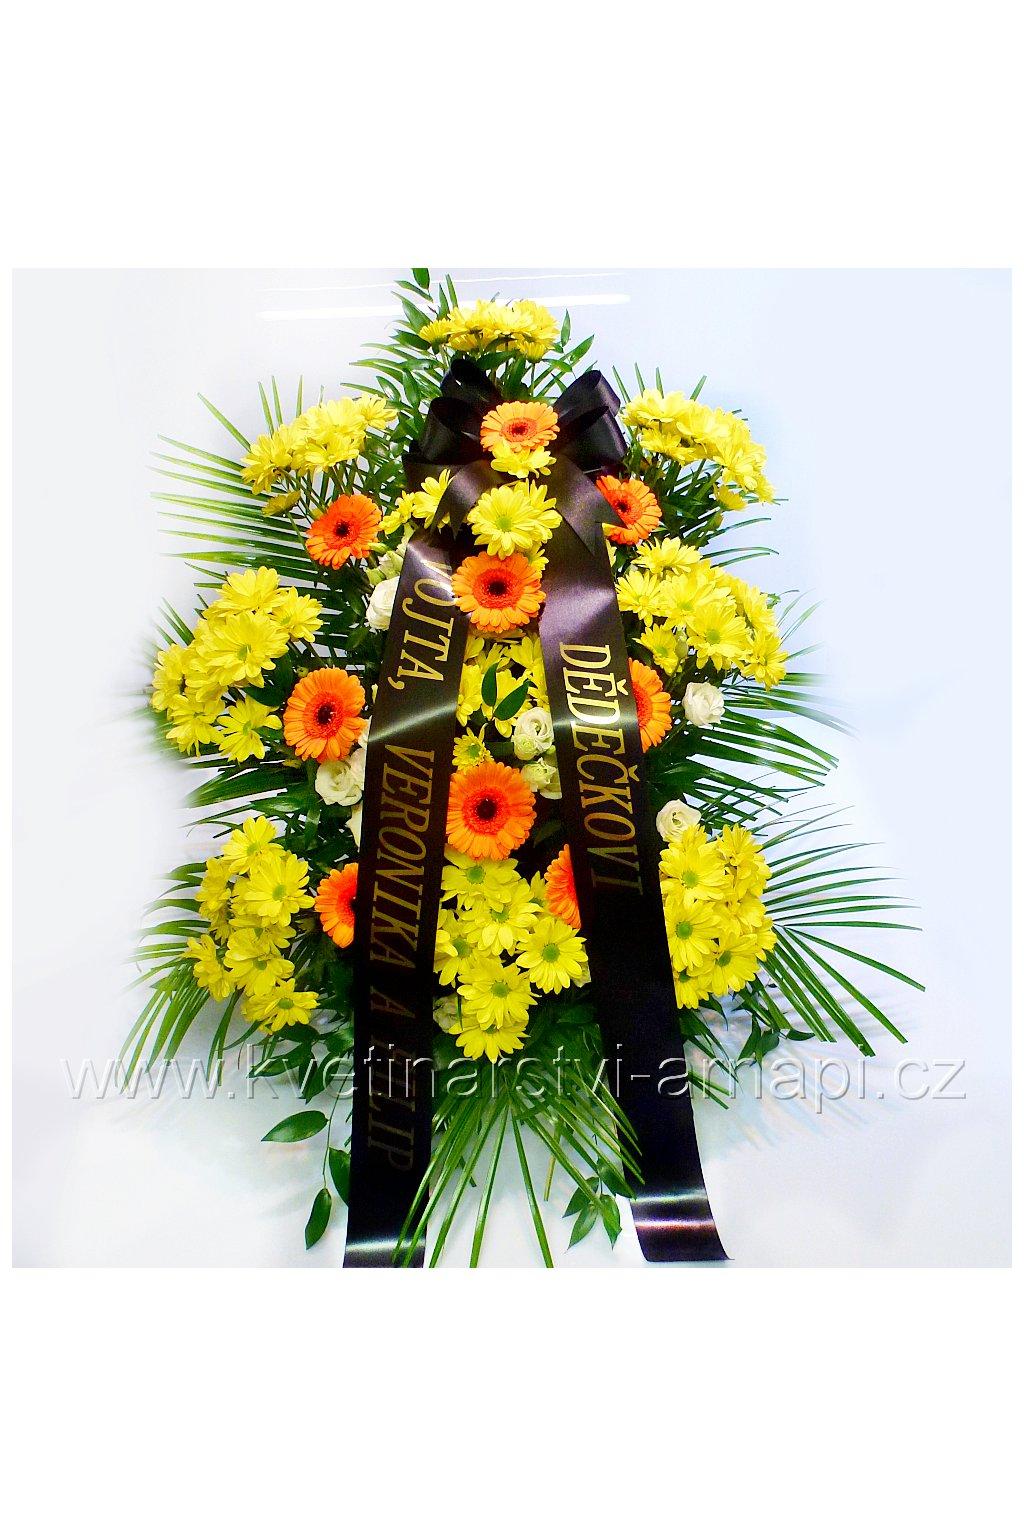 smutecni kytice gerbery kvetinarstvi arnapi